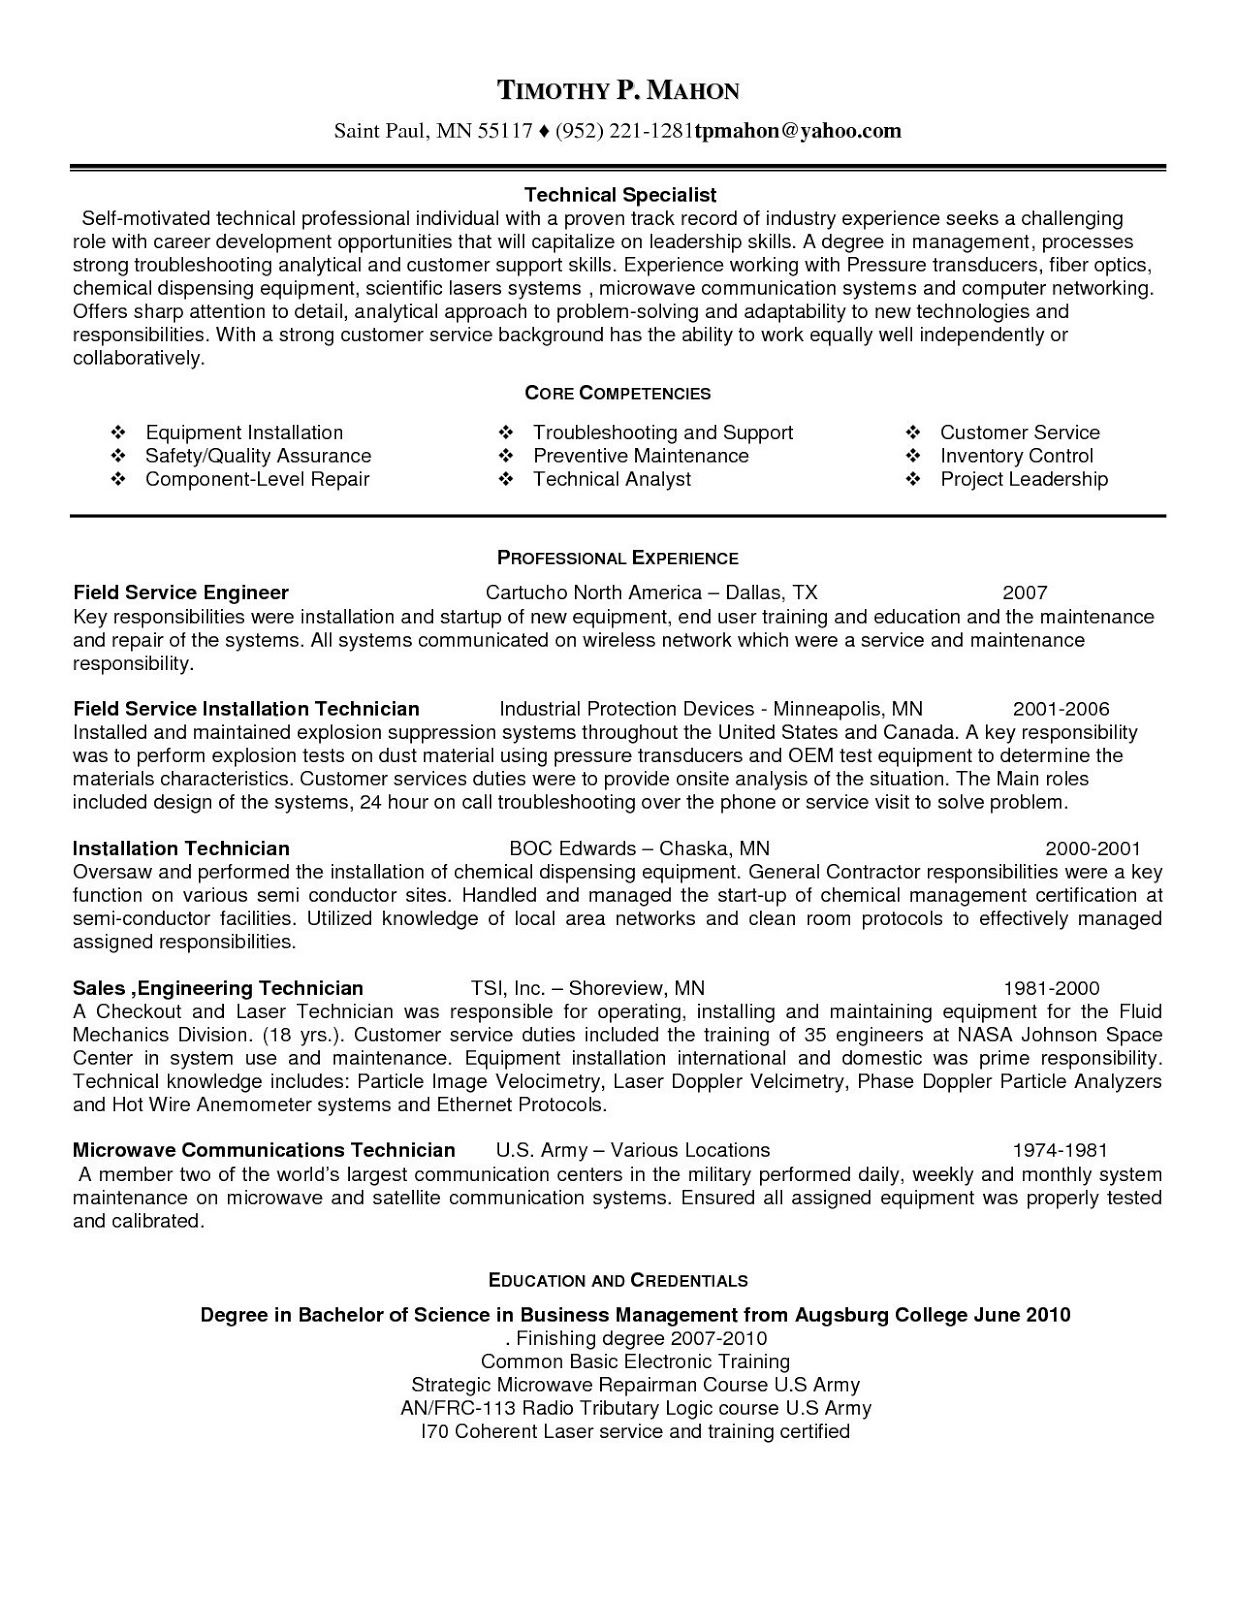 Maintenance Man Resume Sample 2019 Maintenance Man Resume Objective 2020